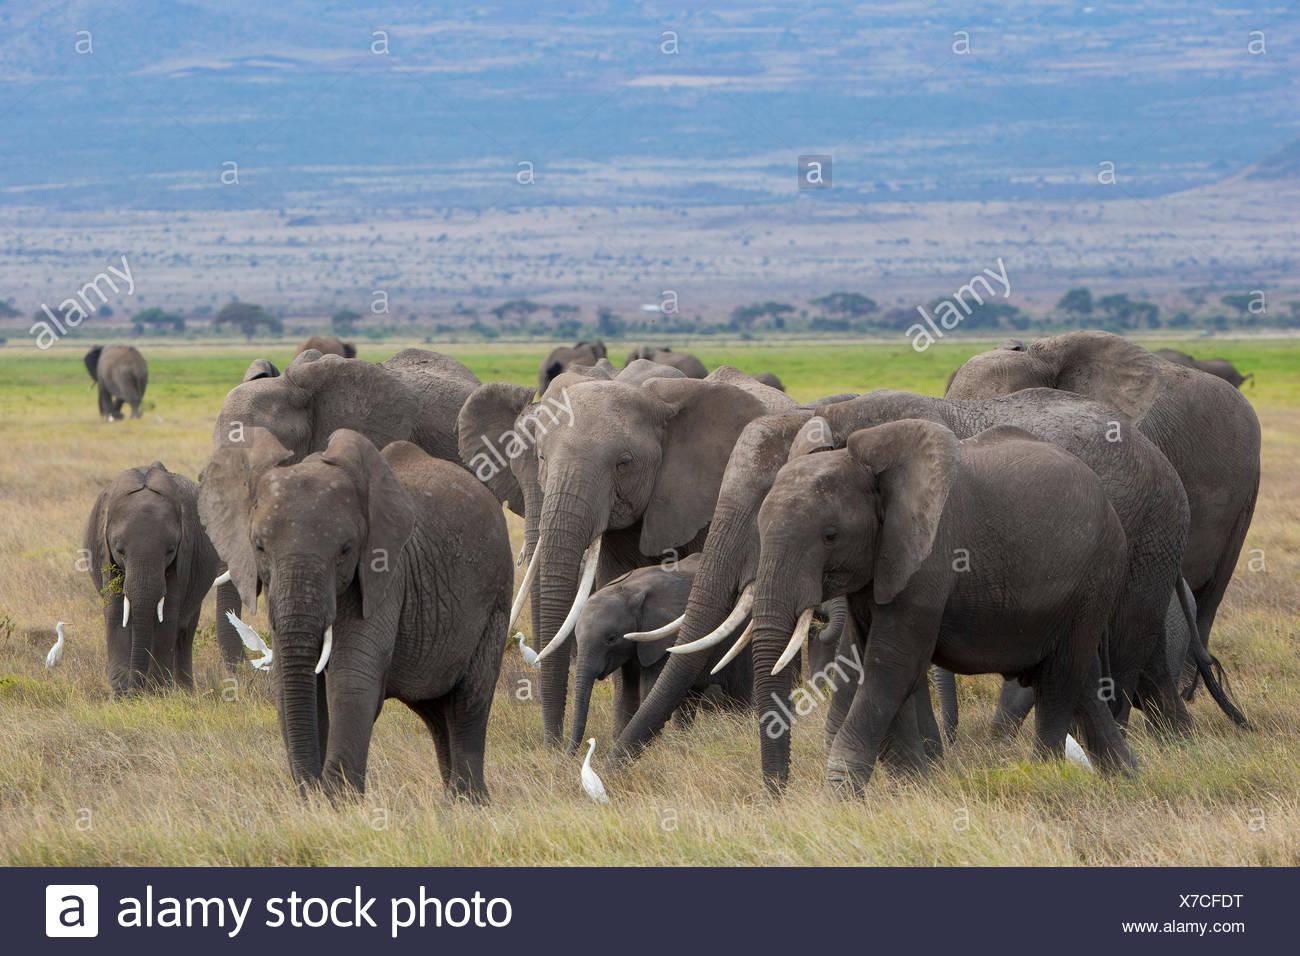 African Elephant (Loxodonta africana) Herd foraging at Amboseli National Park Kenya - Stock Image